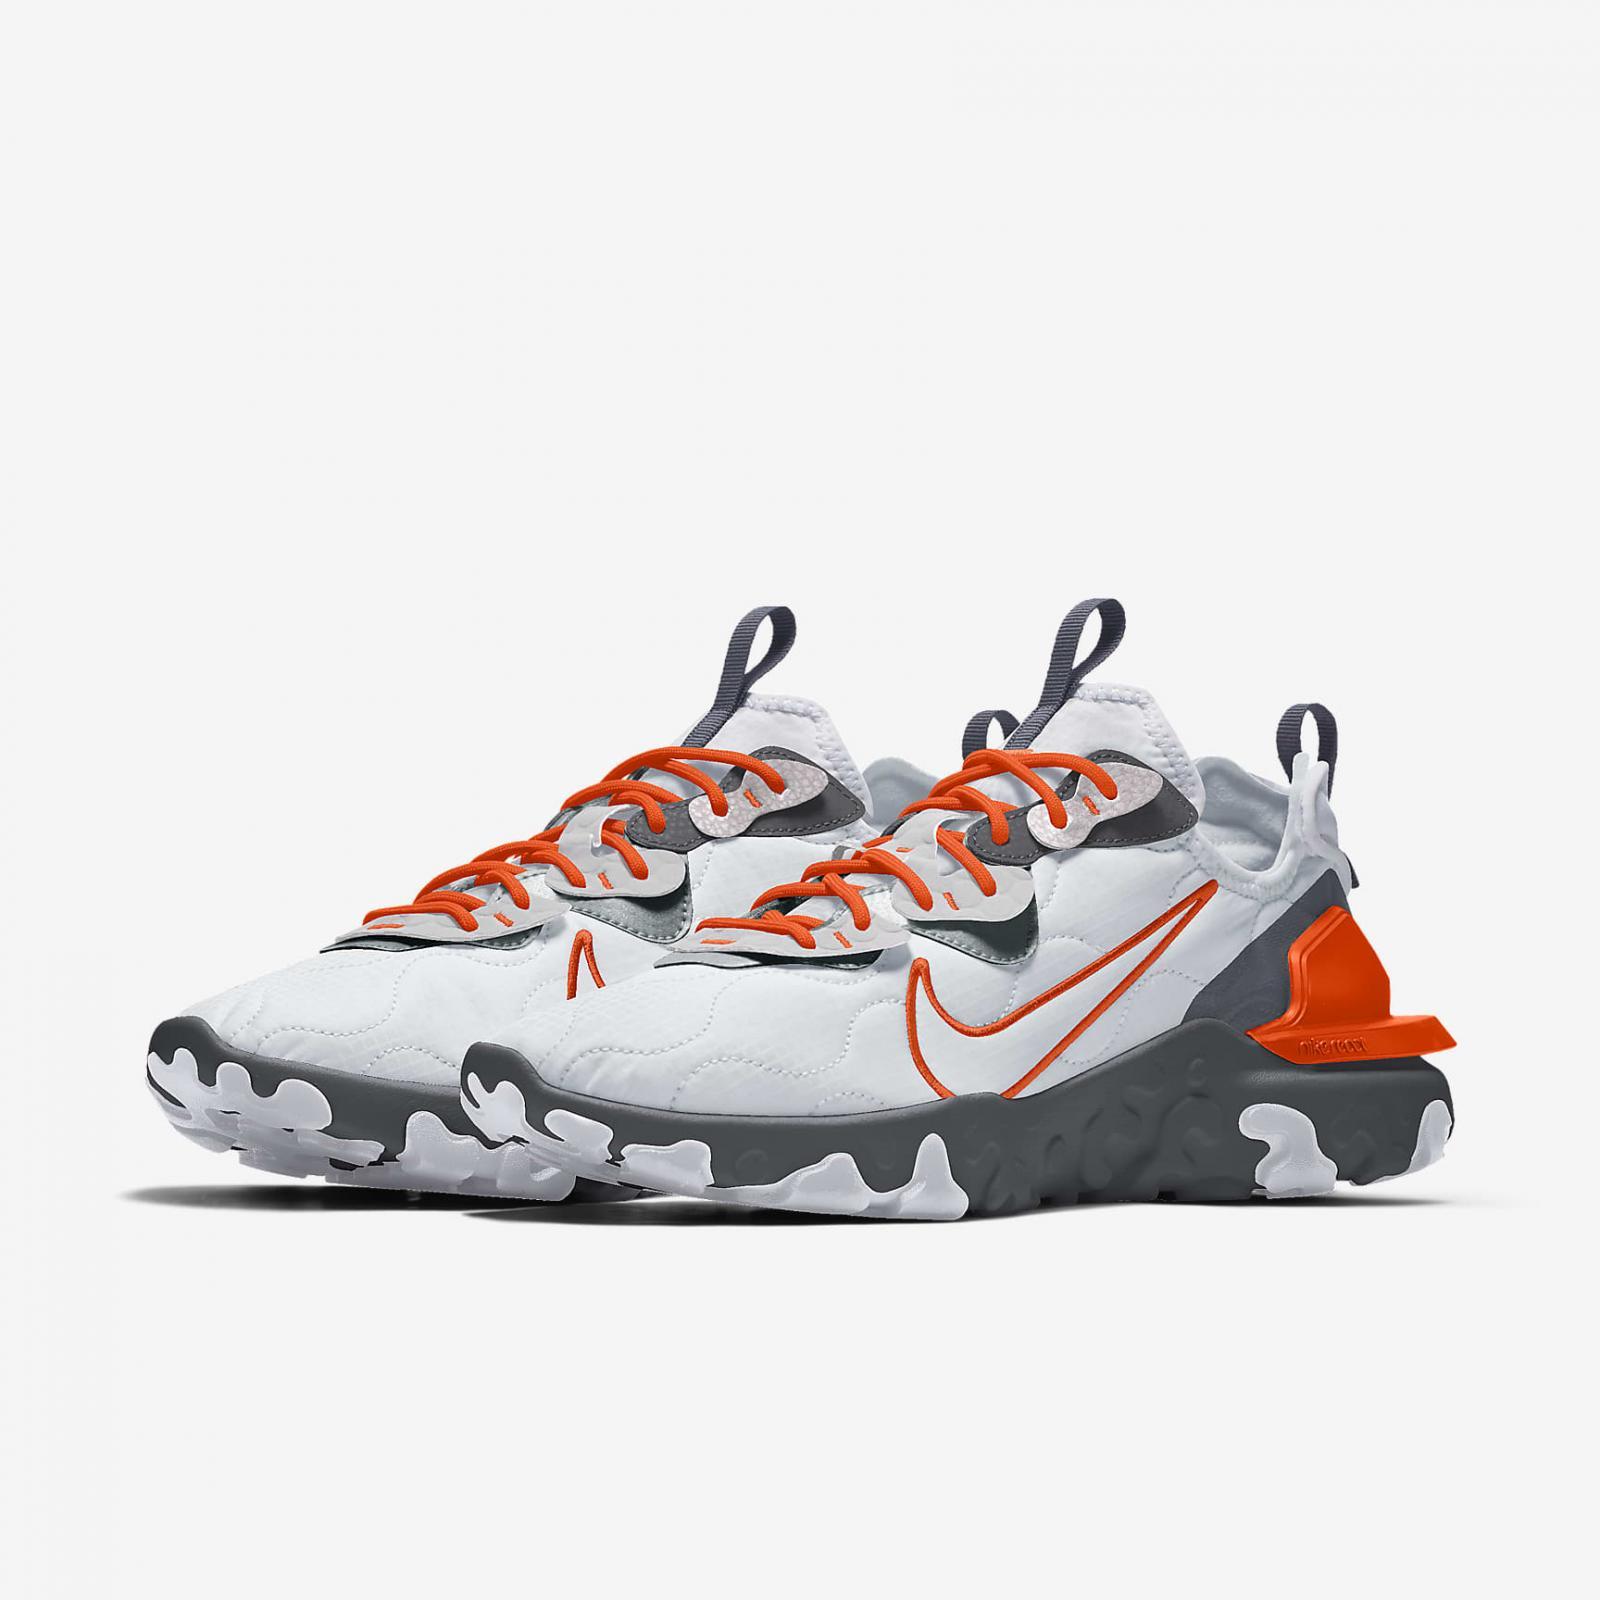 Nike By You将推出全新React Vision 3M™